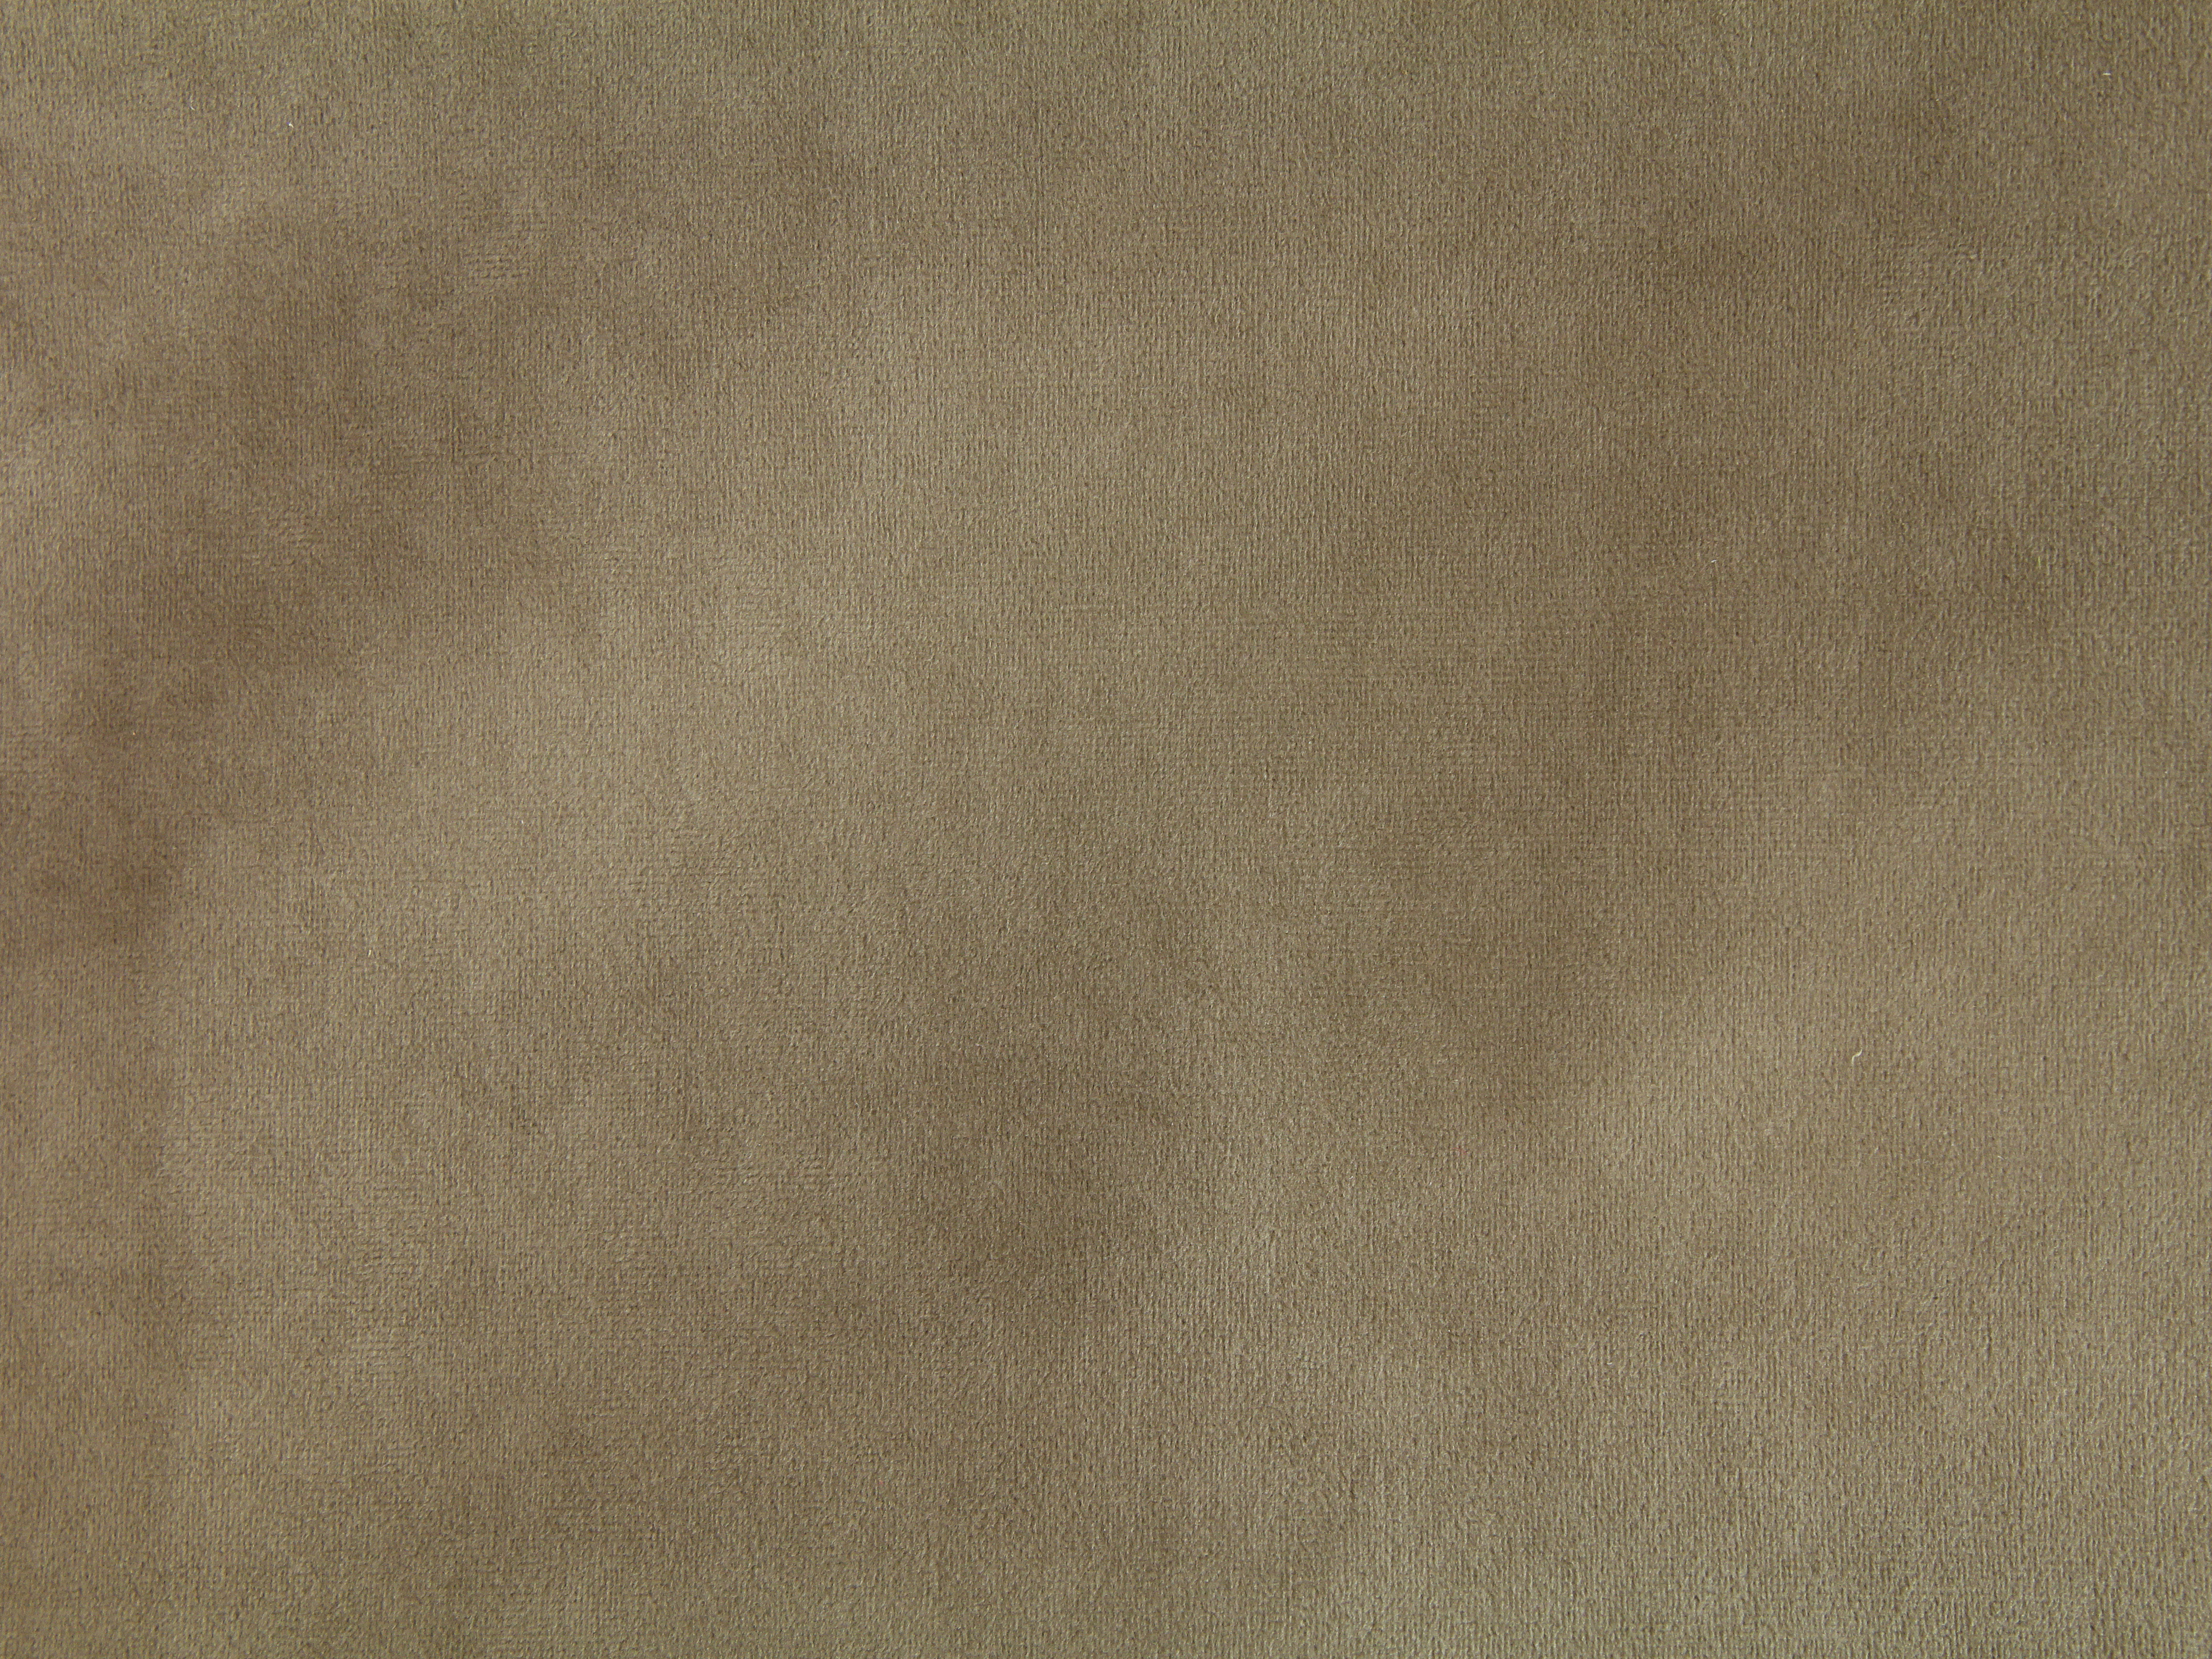 tan suede texture fuzzy fabric brown soft cloth photo - TextureX ...